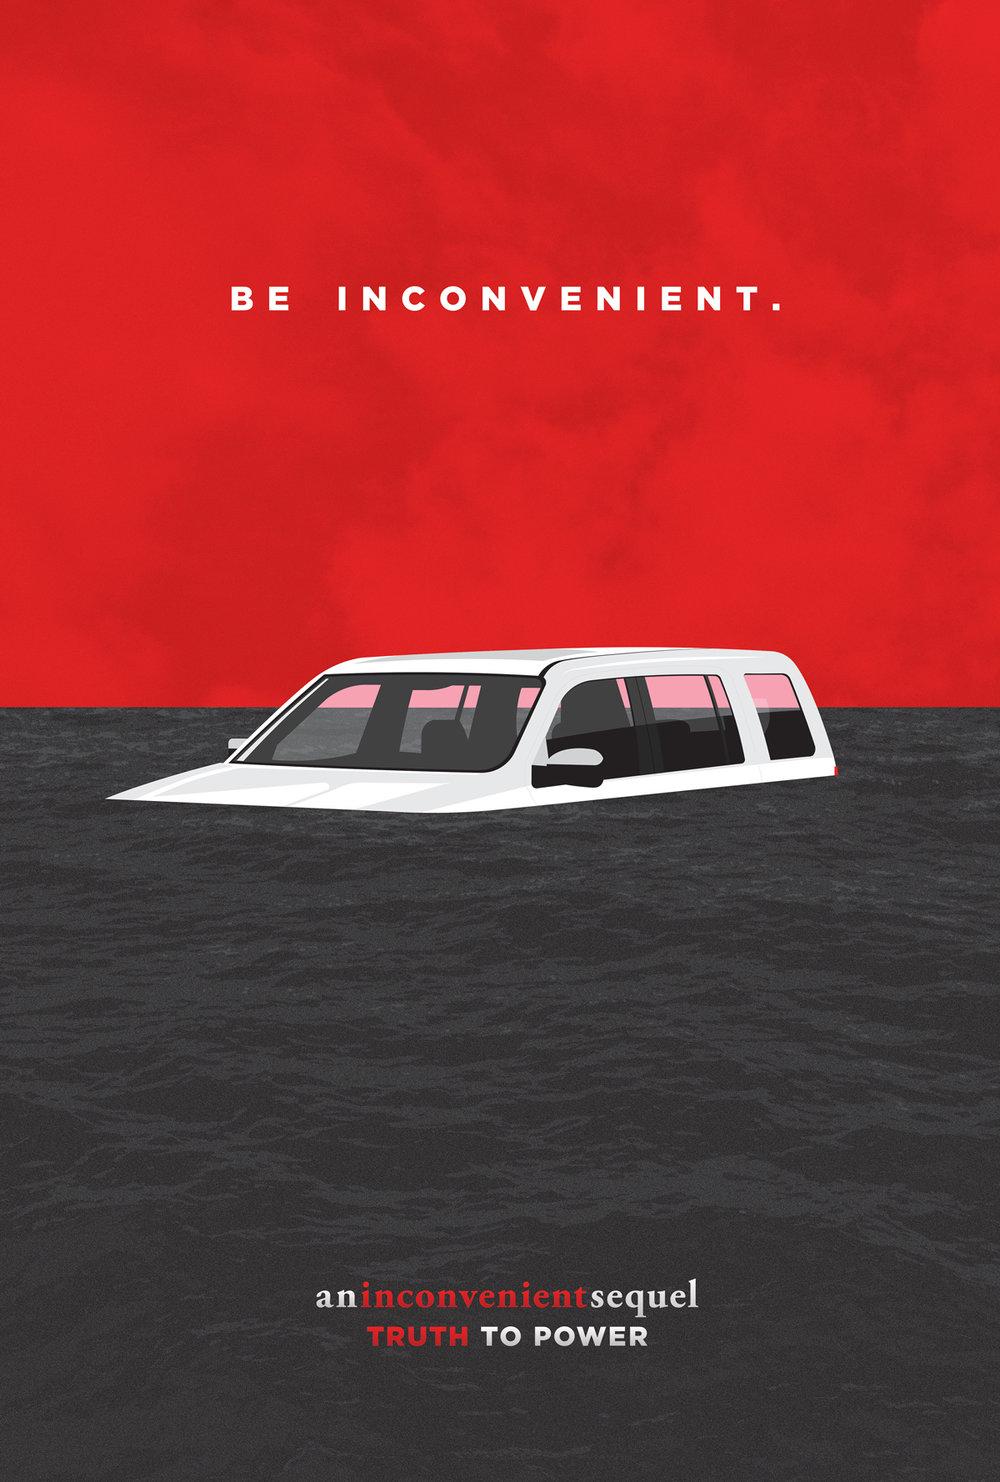 AnInconvenientSequel_Poster-web.jpg